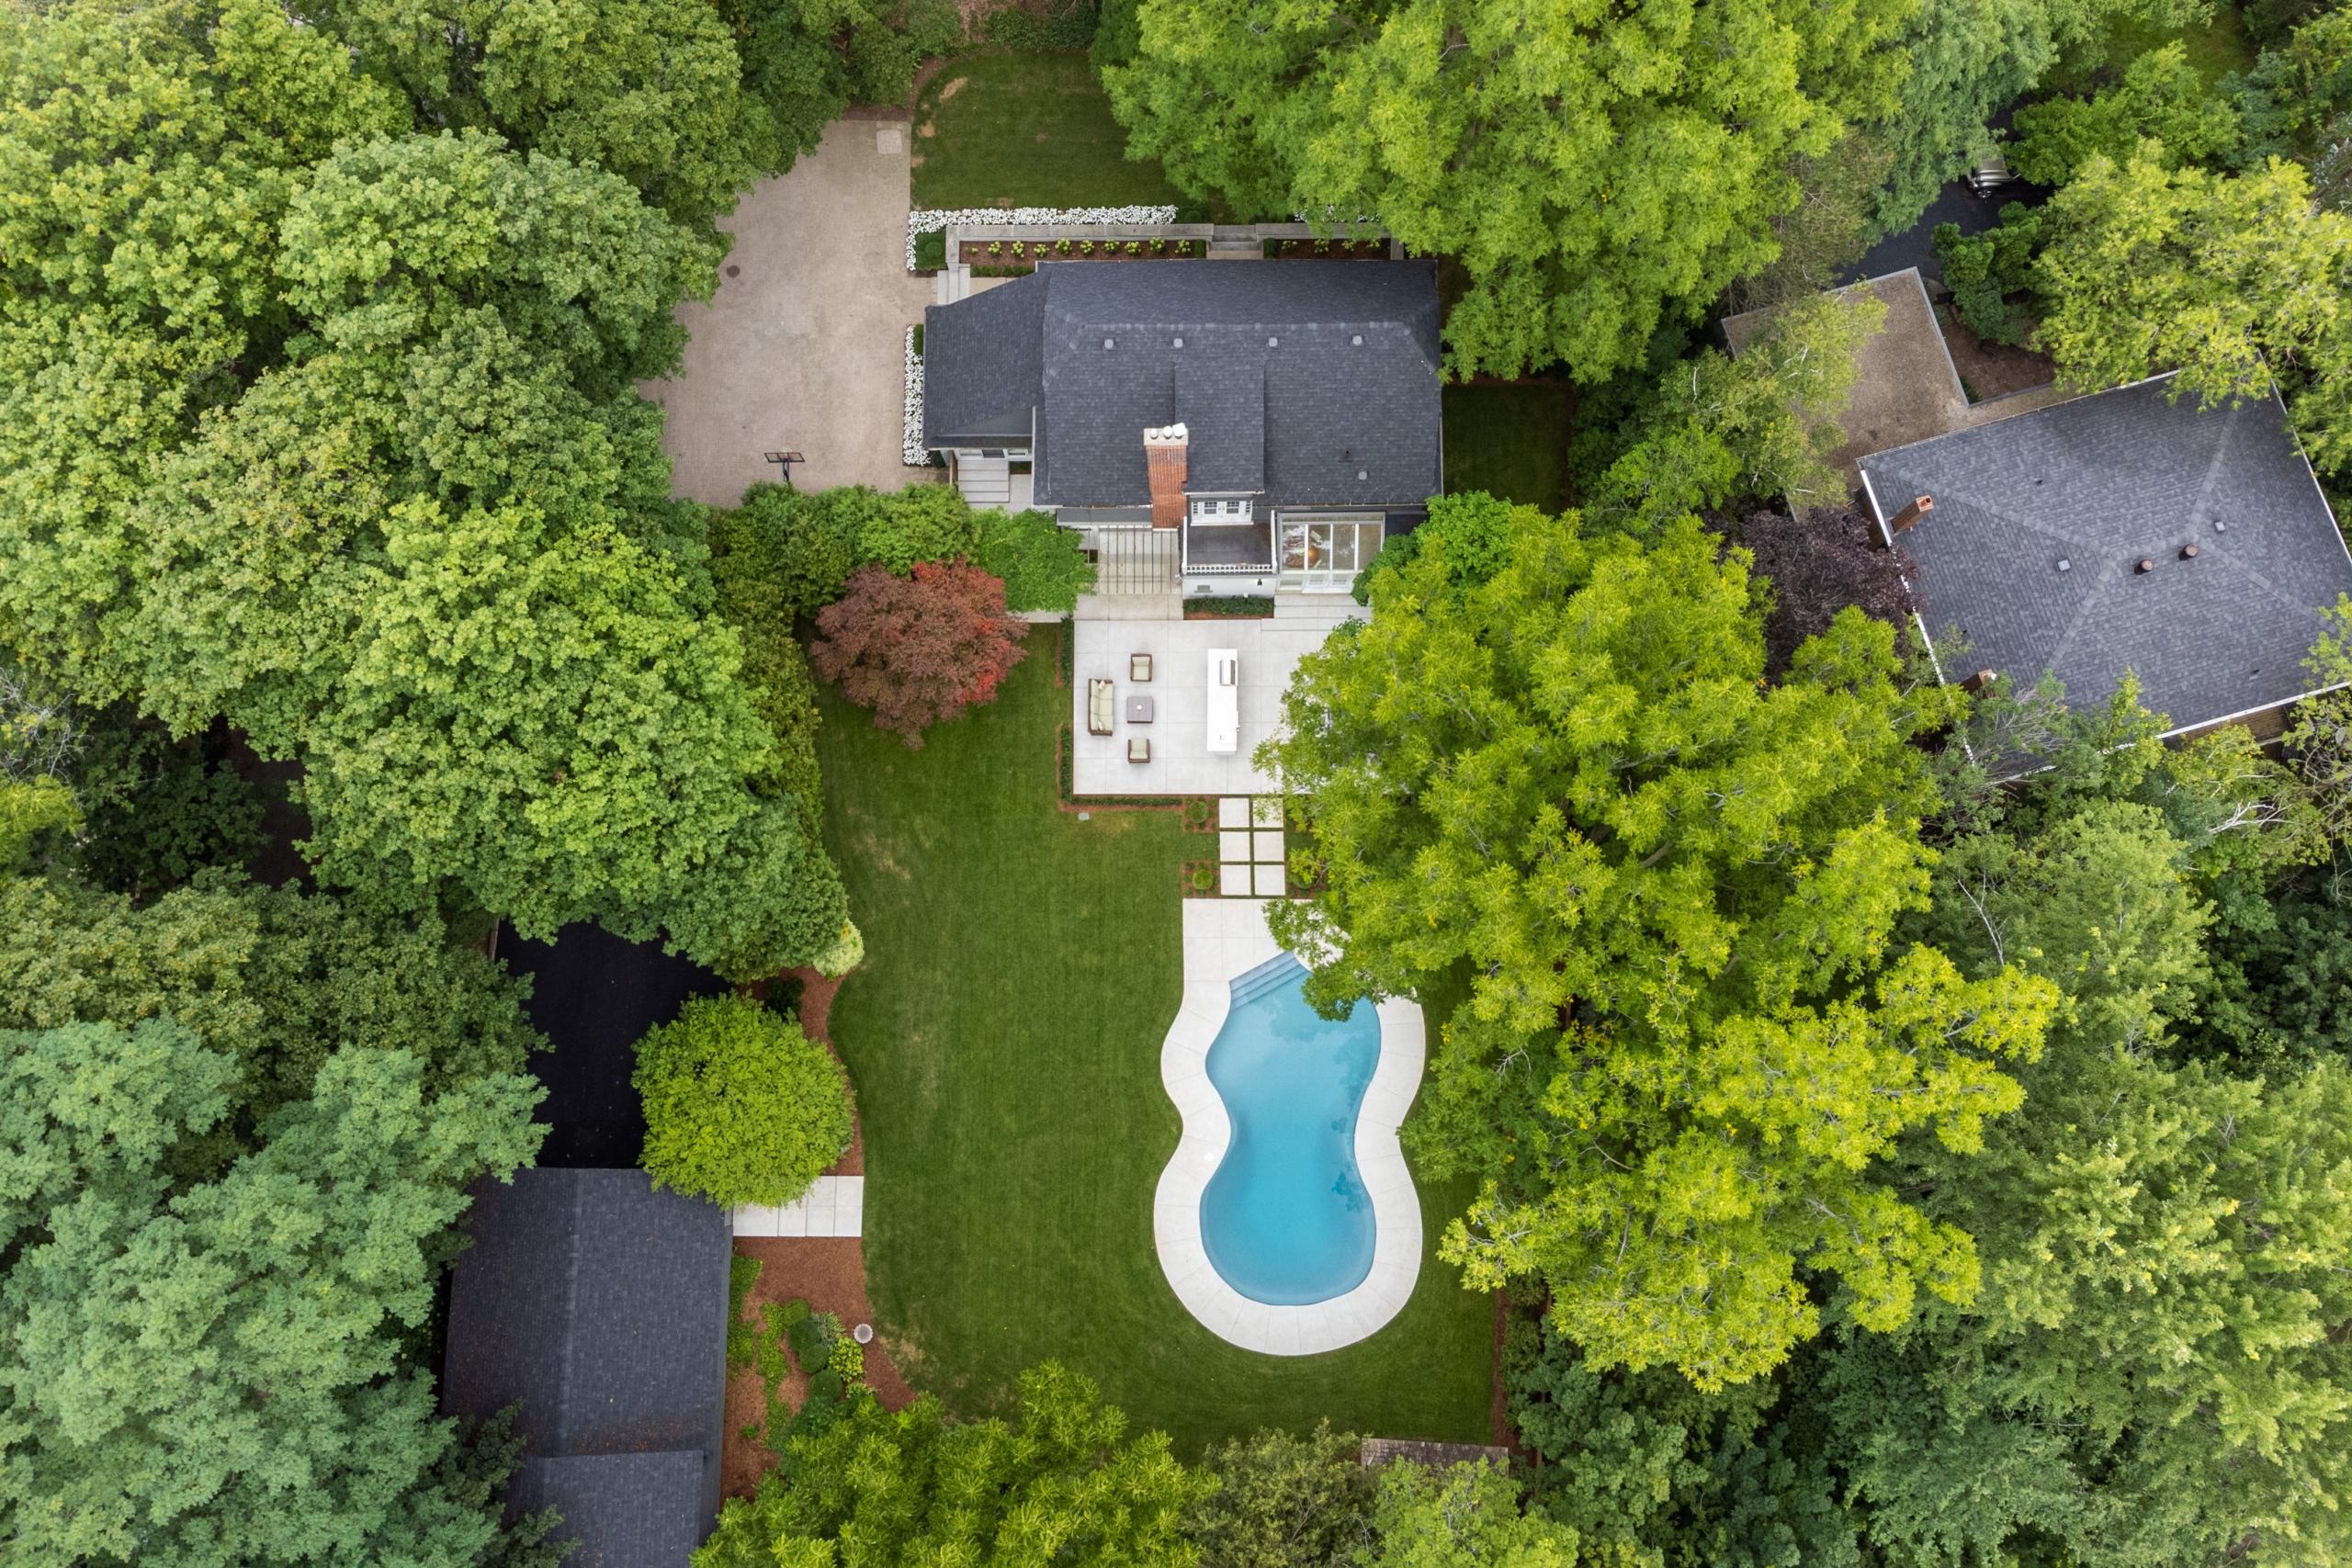 Swimming pool featured at 573 Lakeshore Road West, Oakville, ON at Alex Irish & Associates